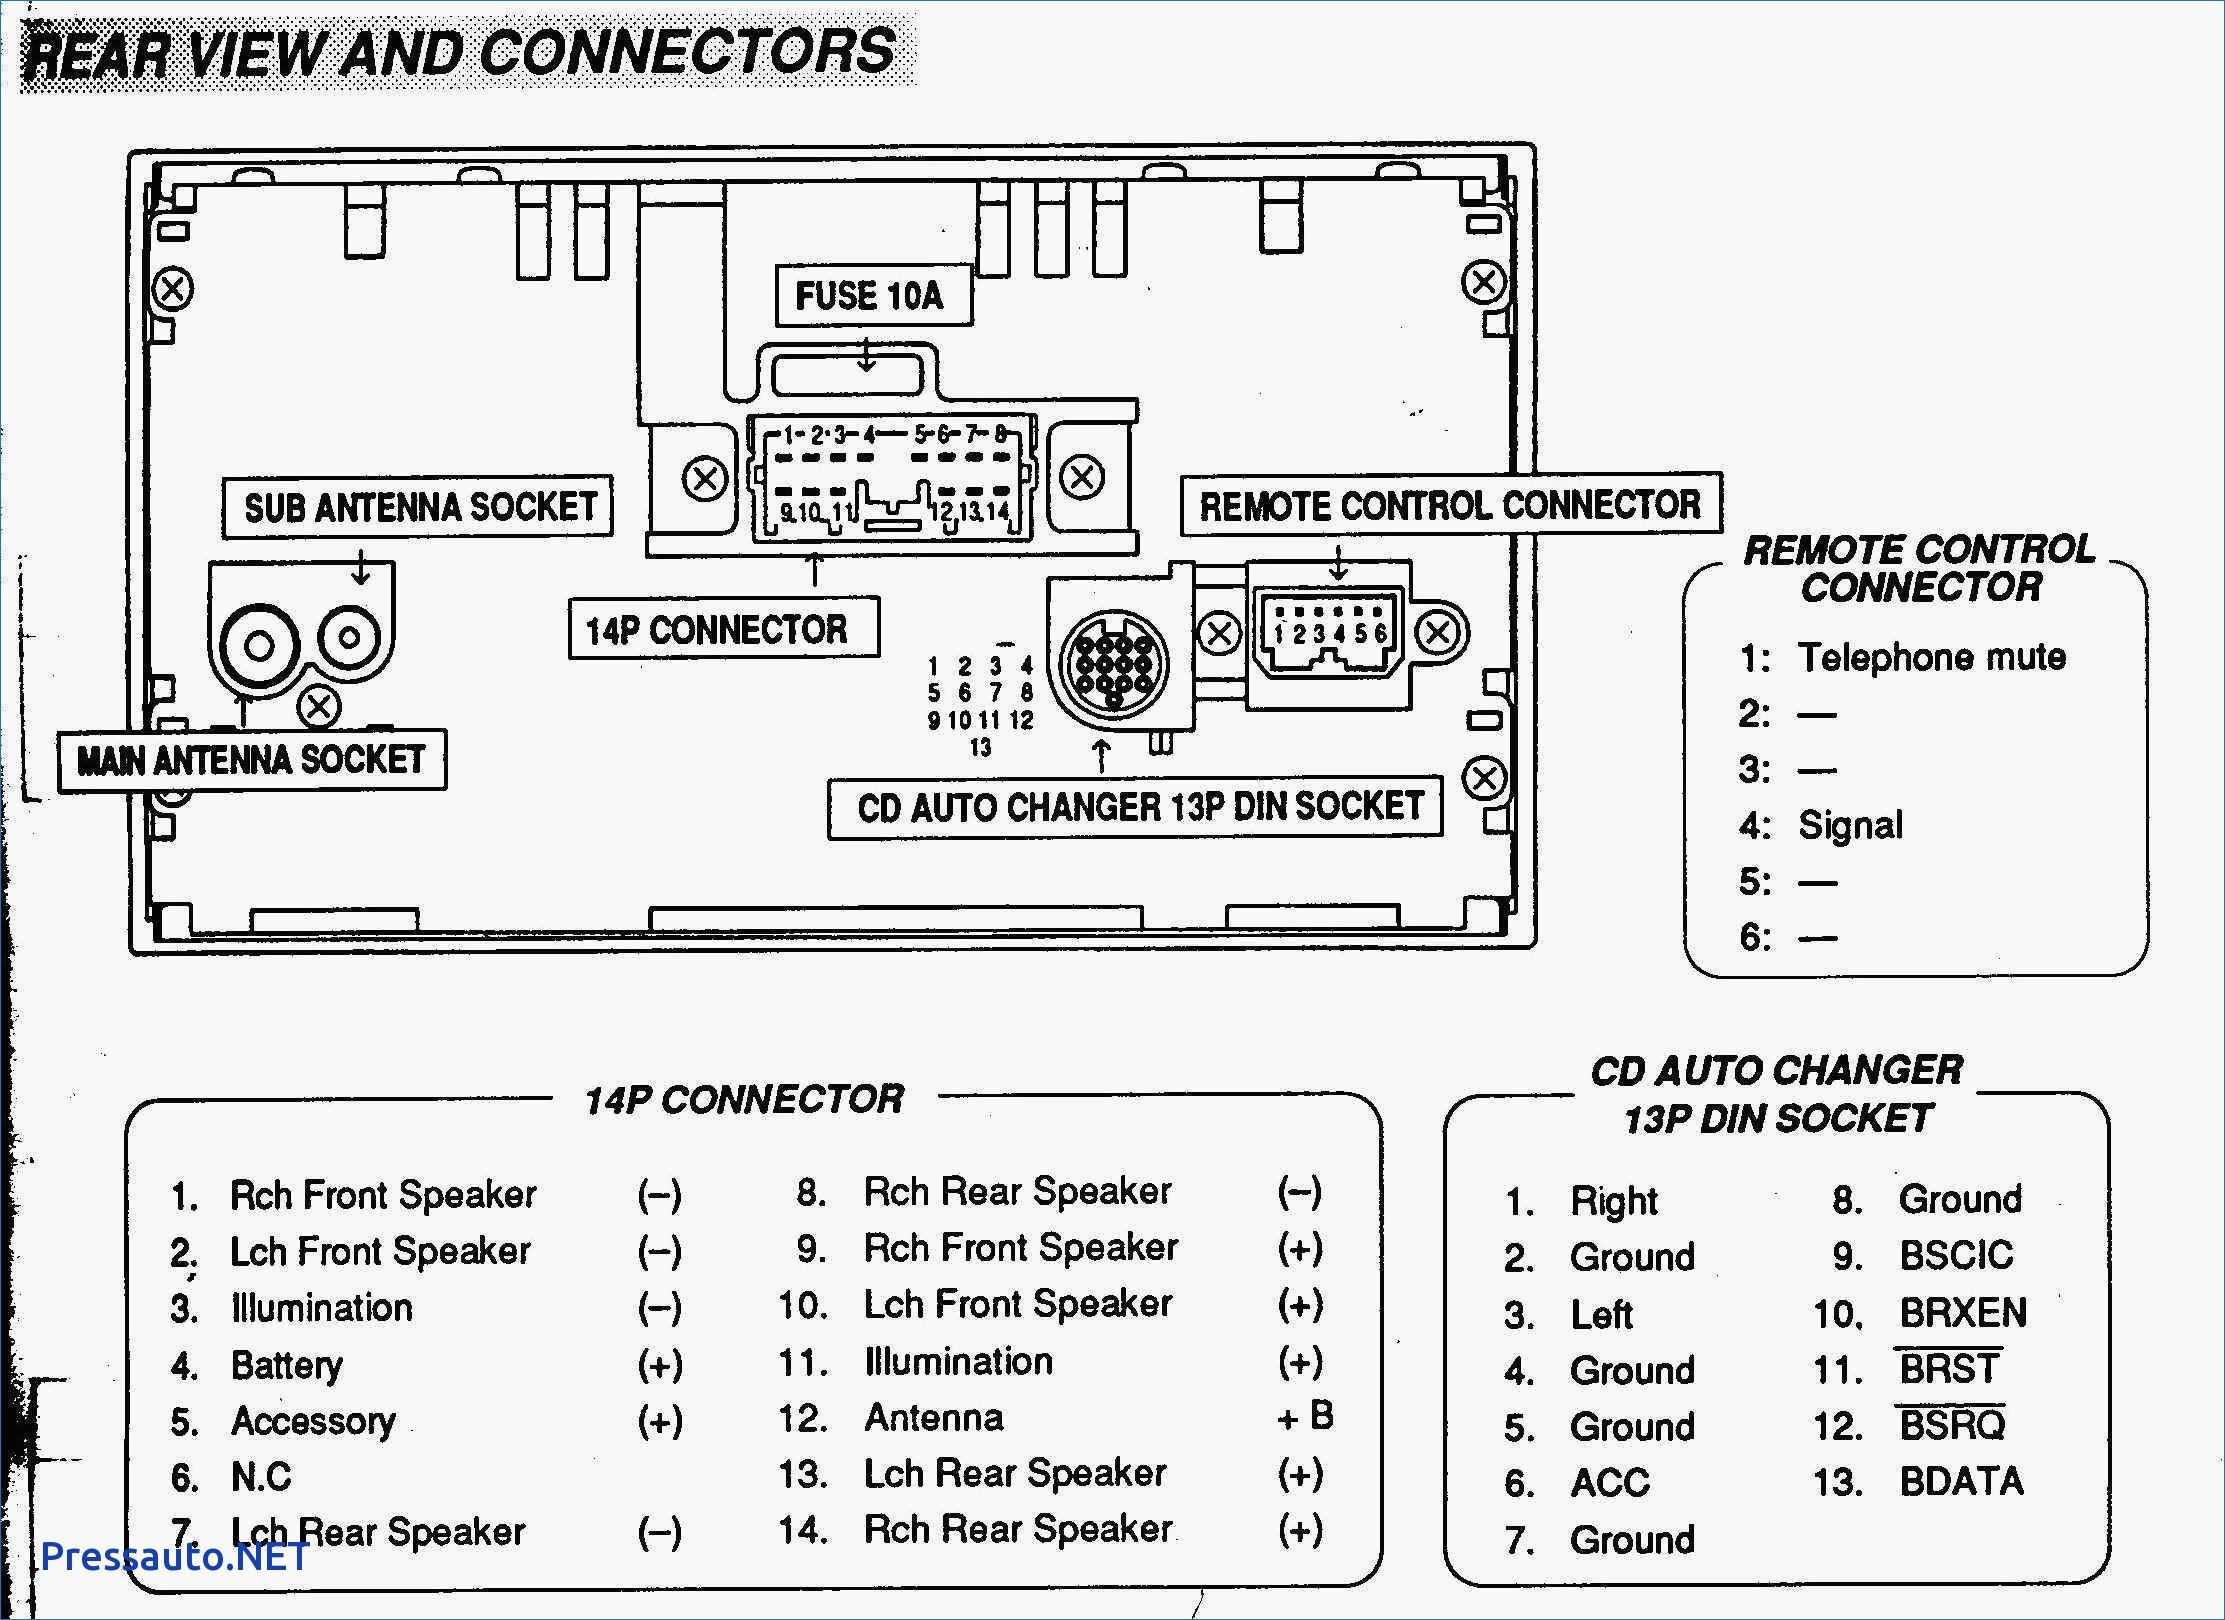 [SCHEMATICS_48YU]  YK_7280] Boss 614Ua Wiring Diagram Free Diagram | Boss 2 Channel Wiring Diagram |  | Ation Usly Osuri Cana Sand Ynthe Sapre Vesi Para Numap Mohammedshrine  Librar Wiring 101